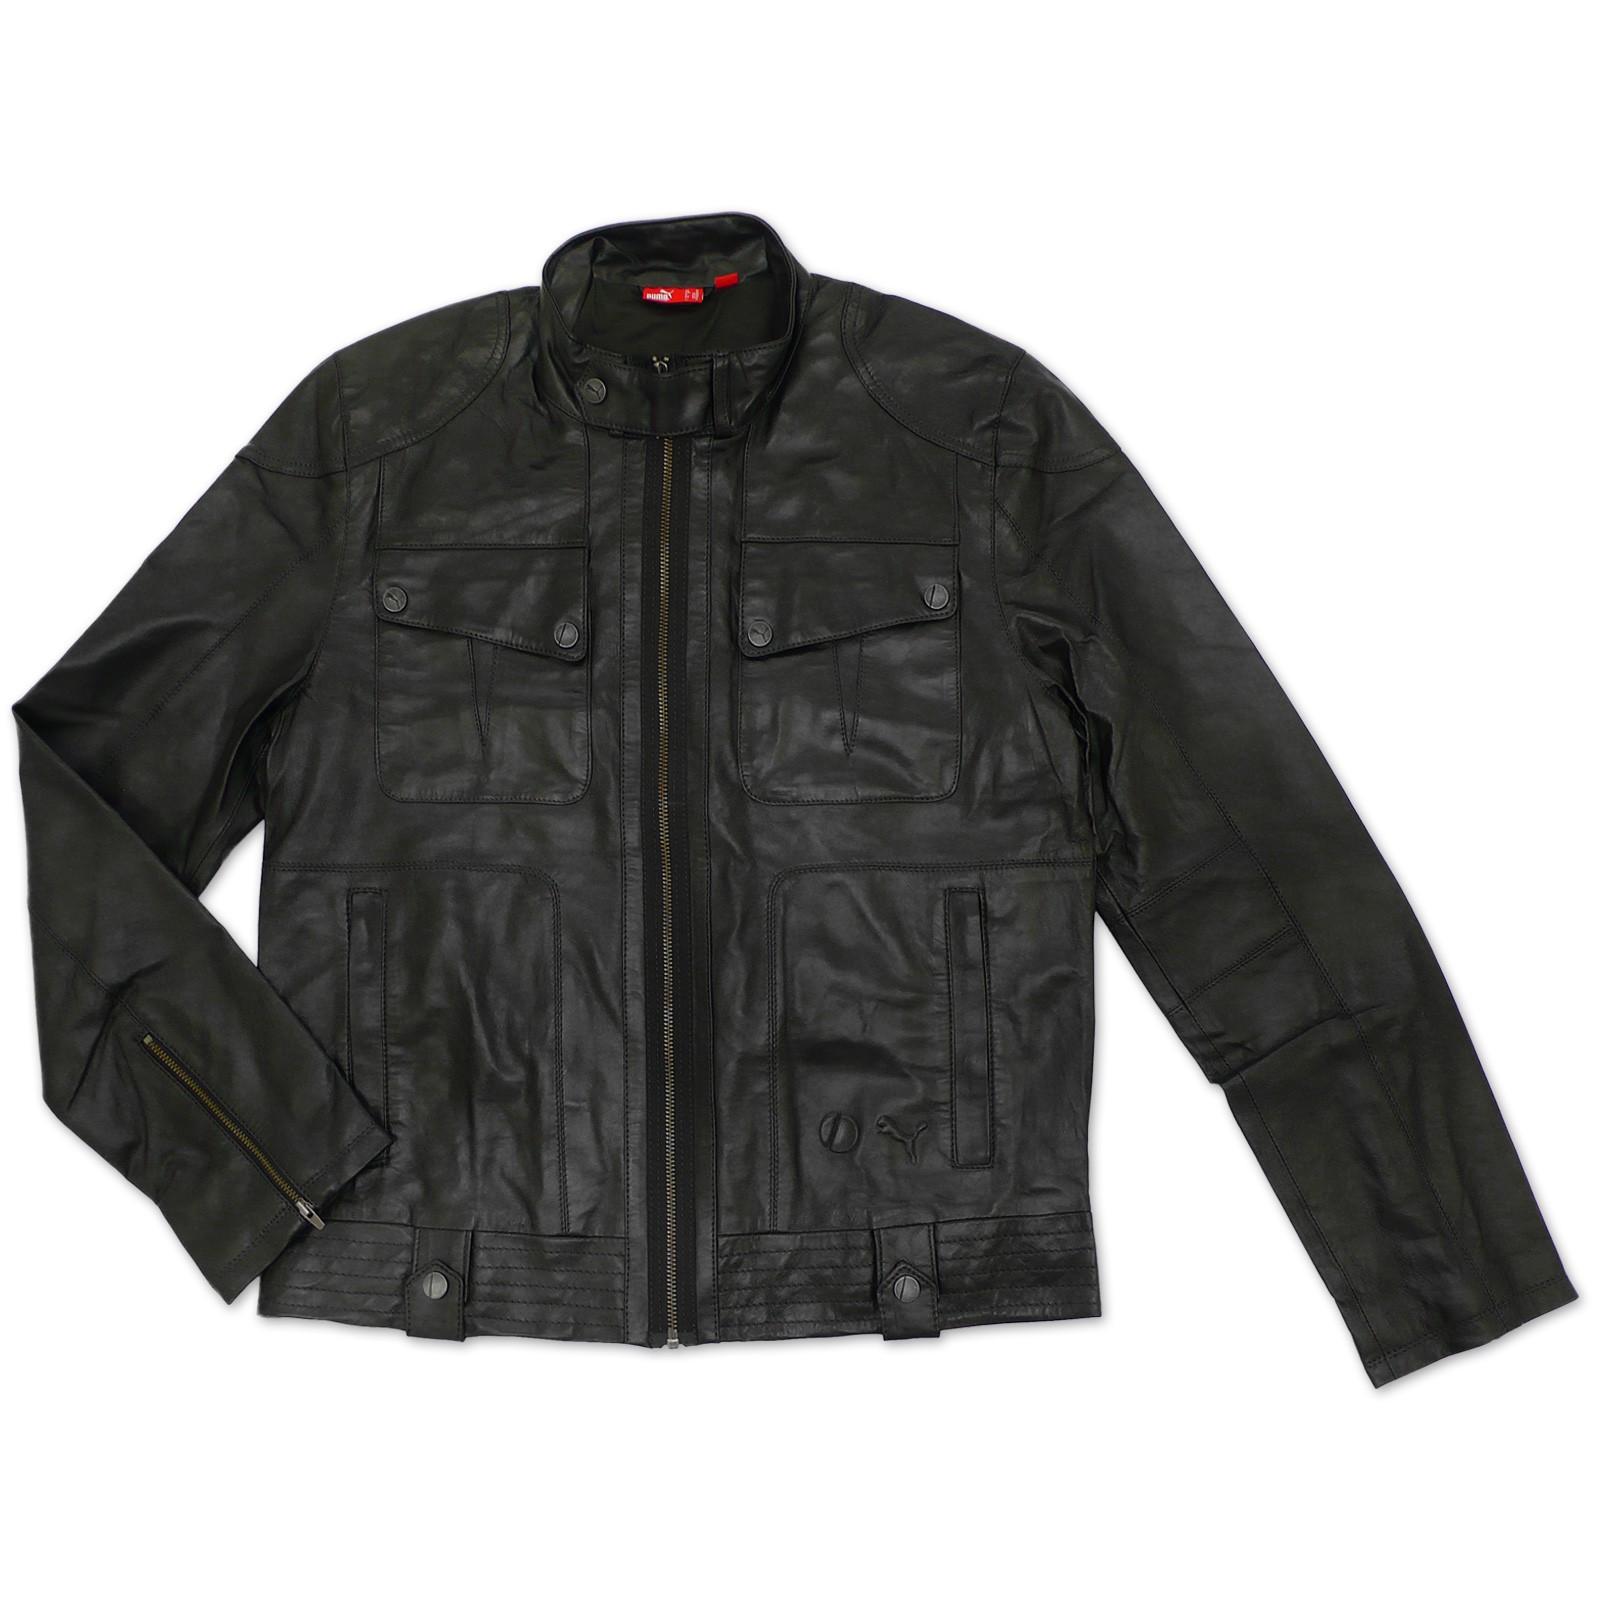 puma ducati men's real leather jacket black biker jacket new